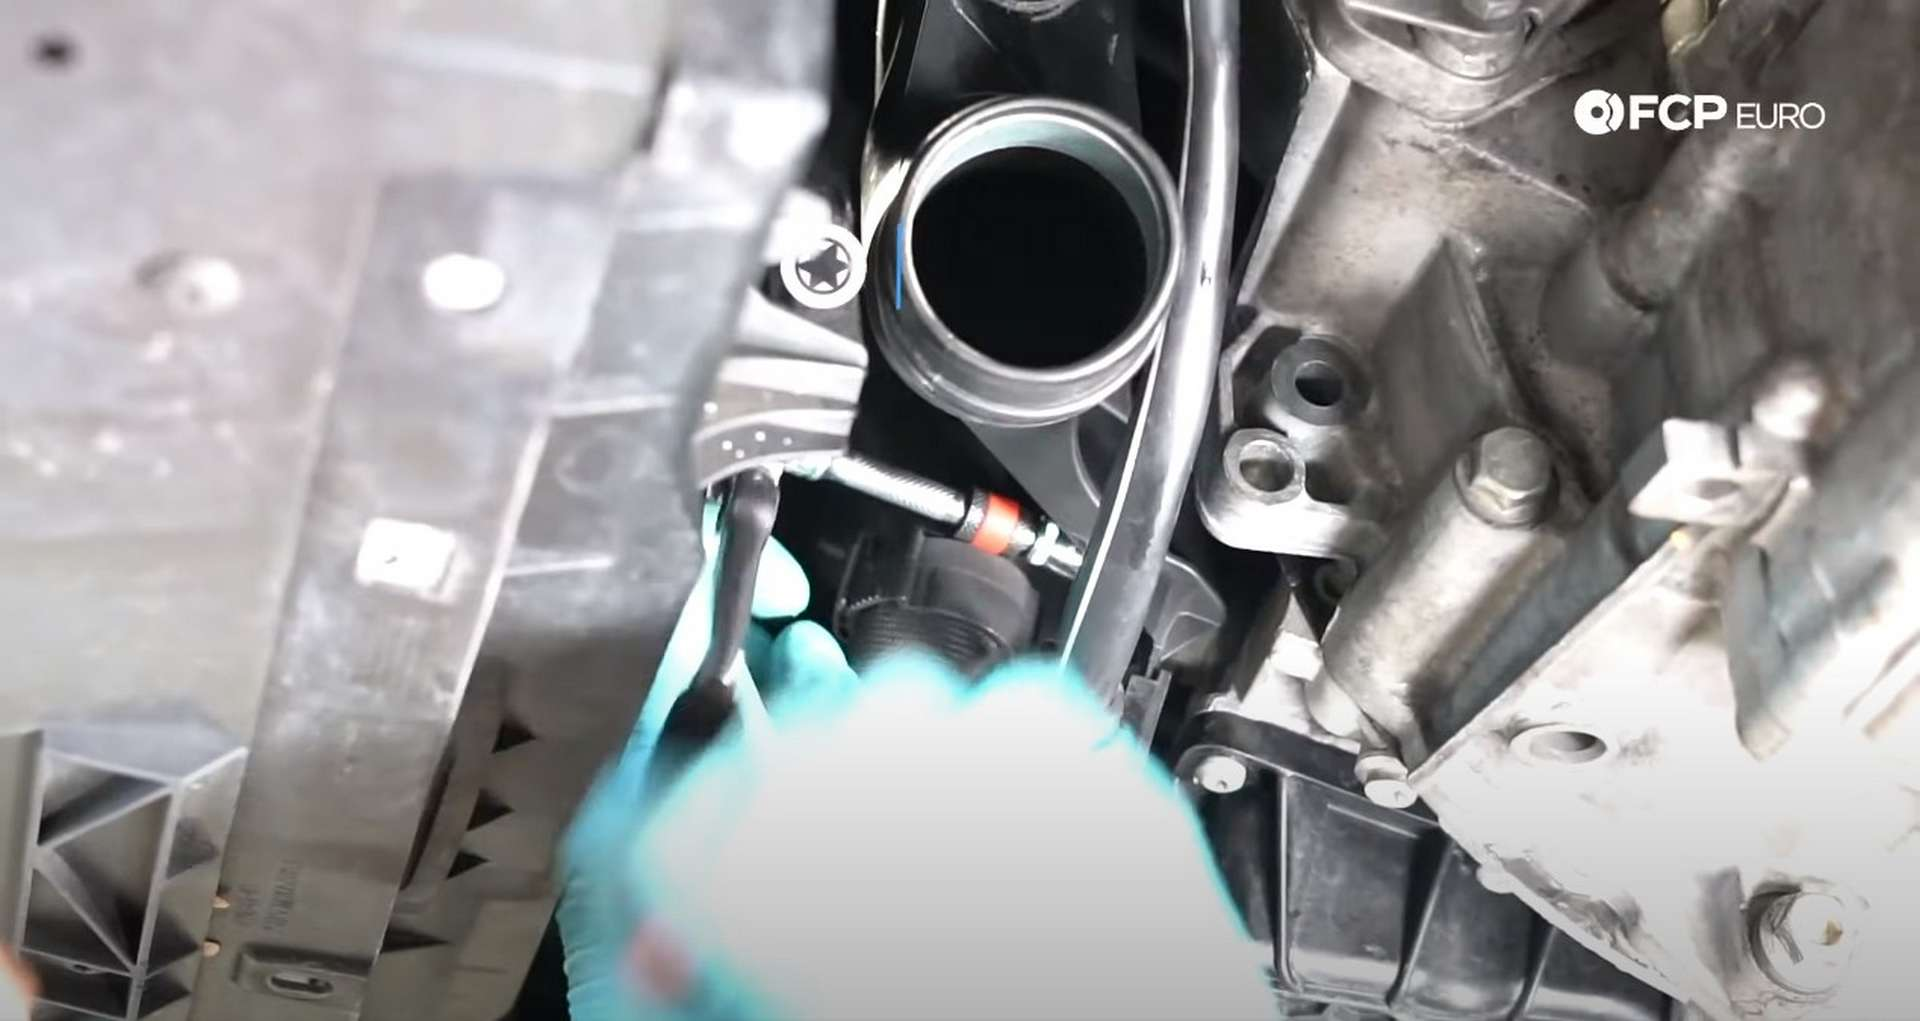 63-DIY_VW_GTI_Clutch-Job-Reinstalling-Starter